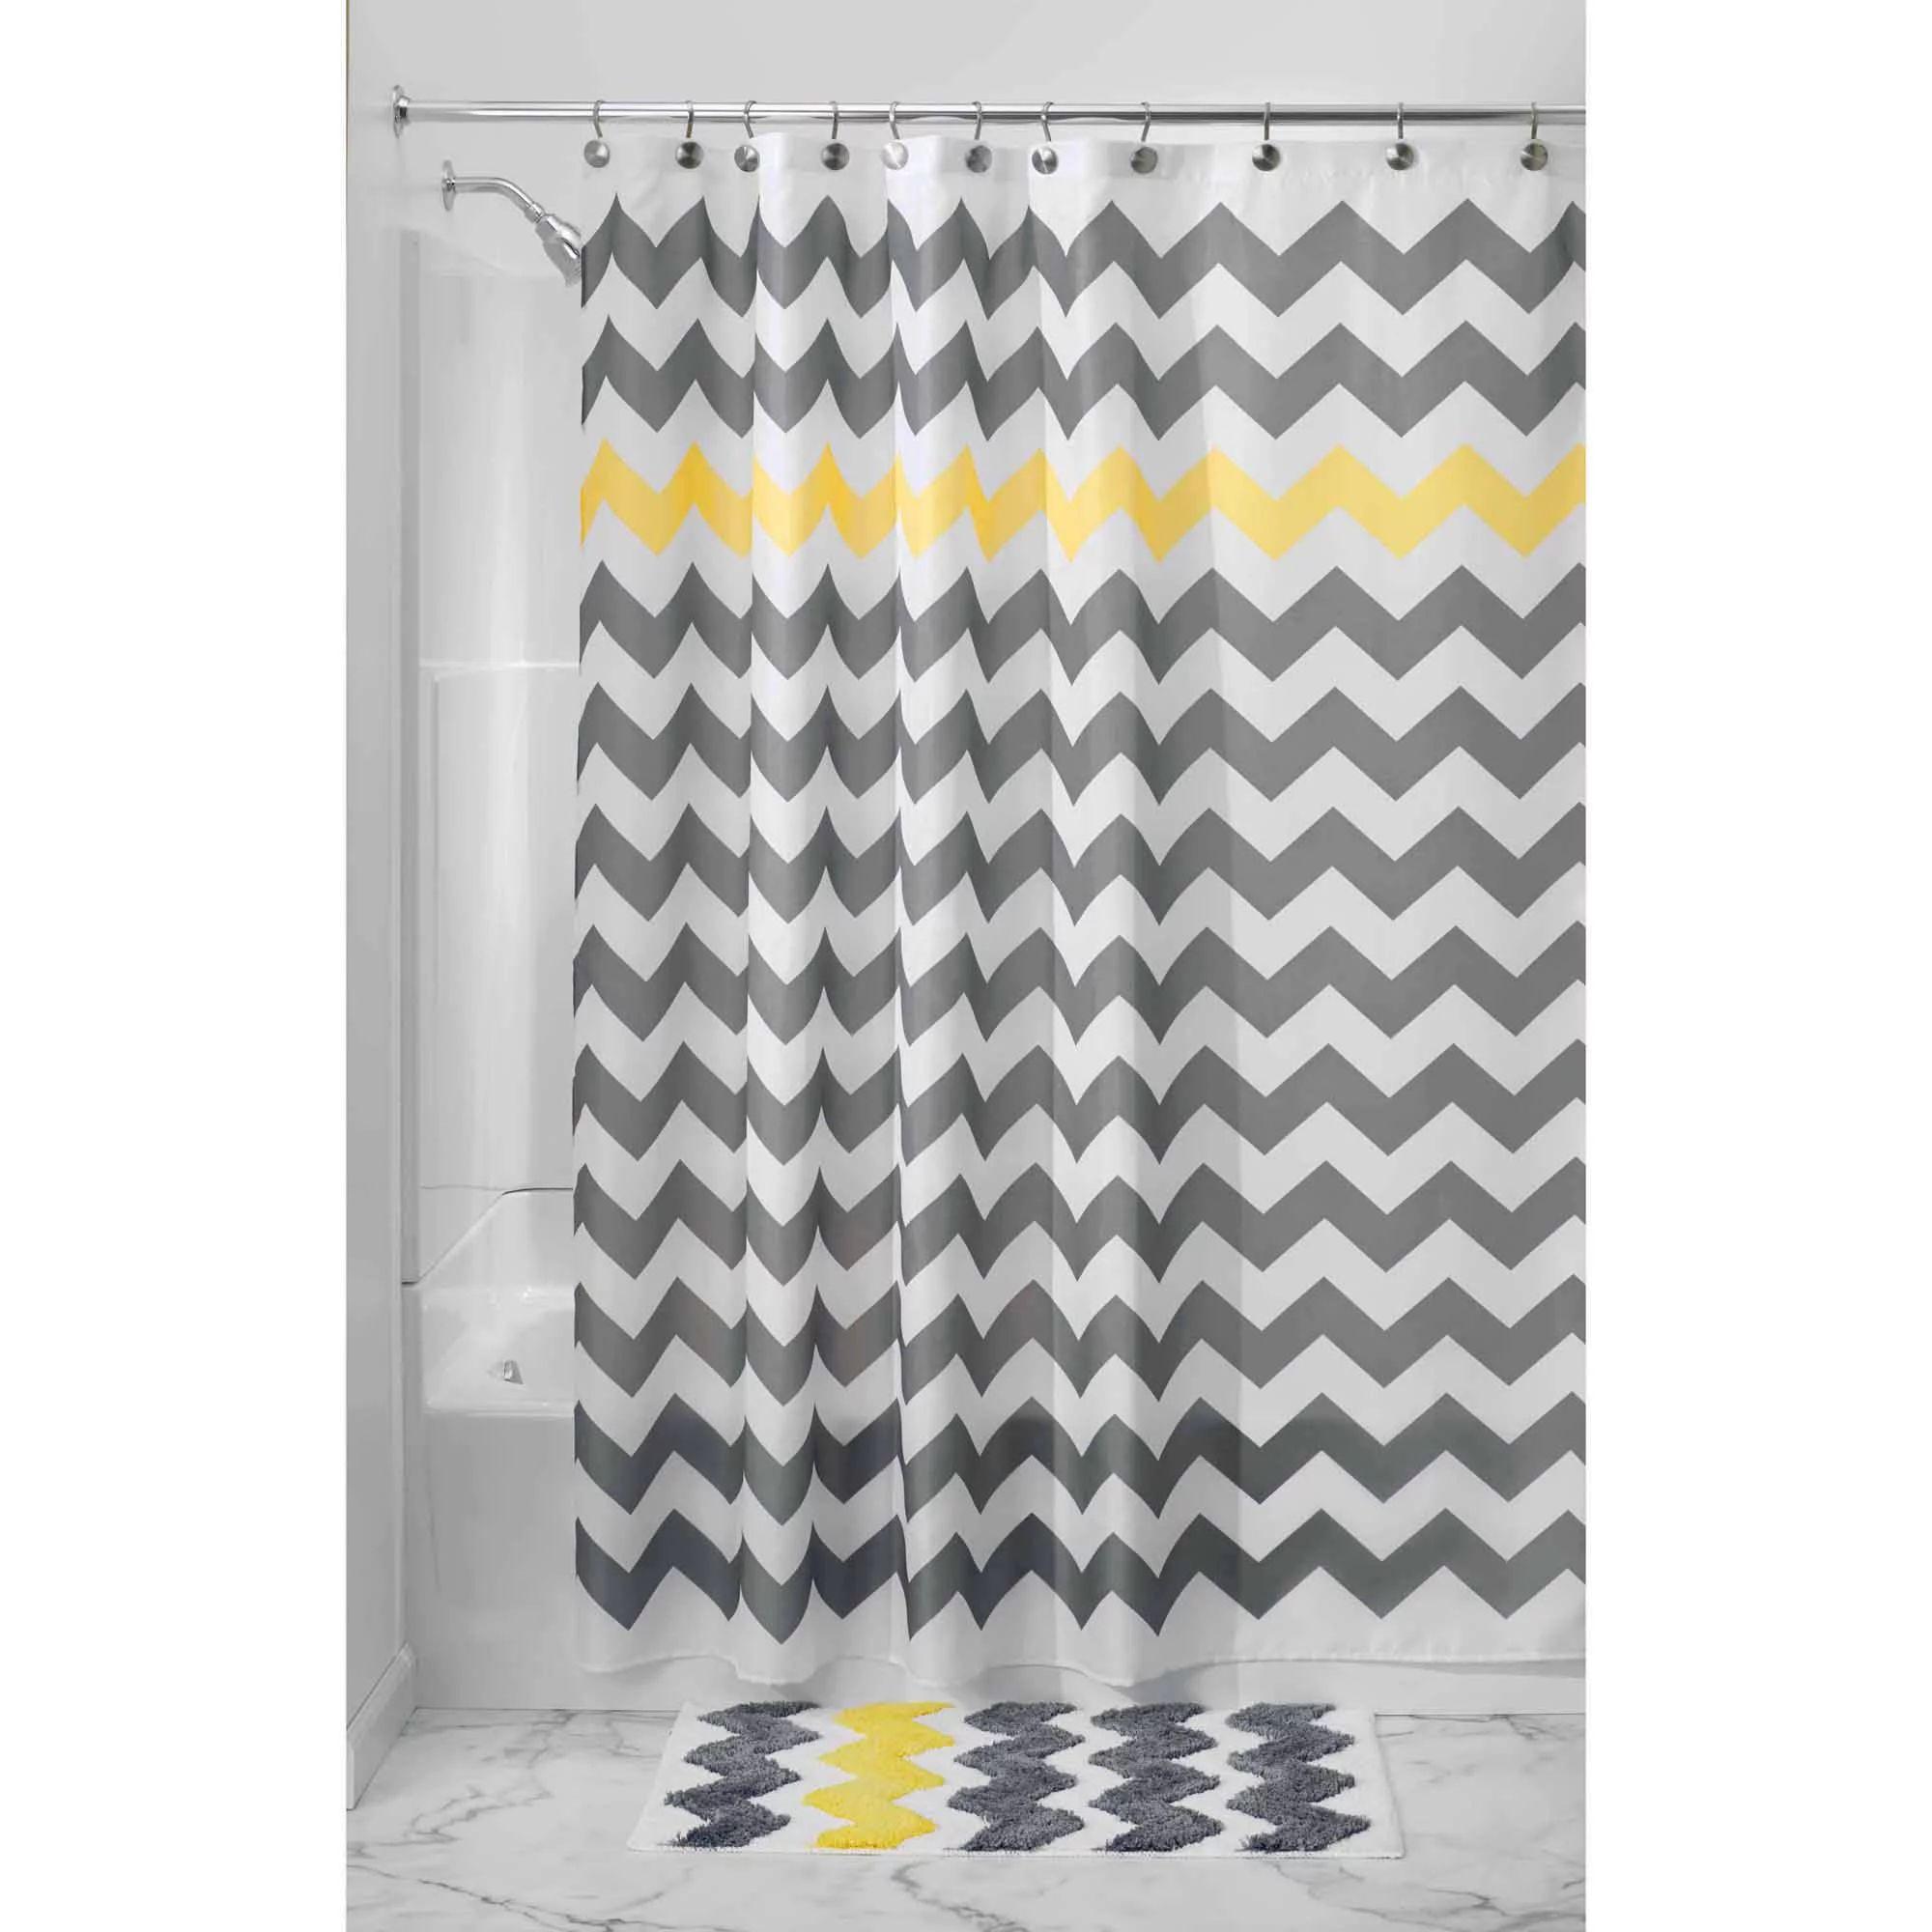 Interdesign chevron fabric shower curtain 72 x 72 various colors